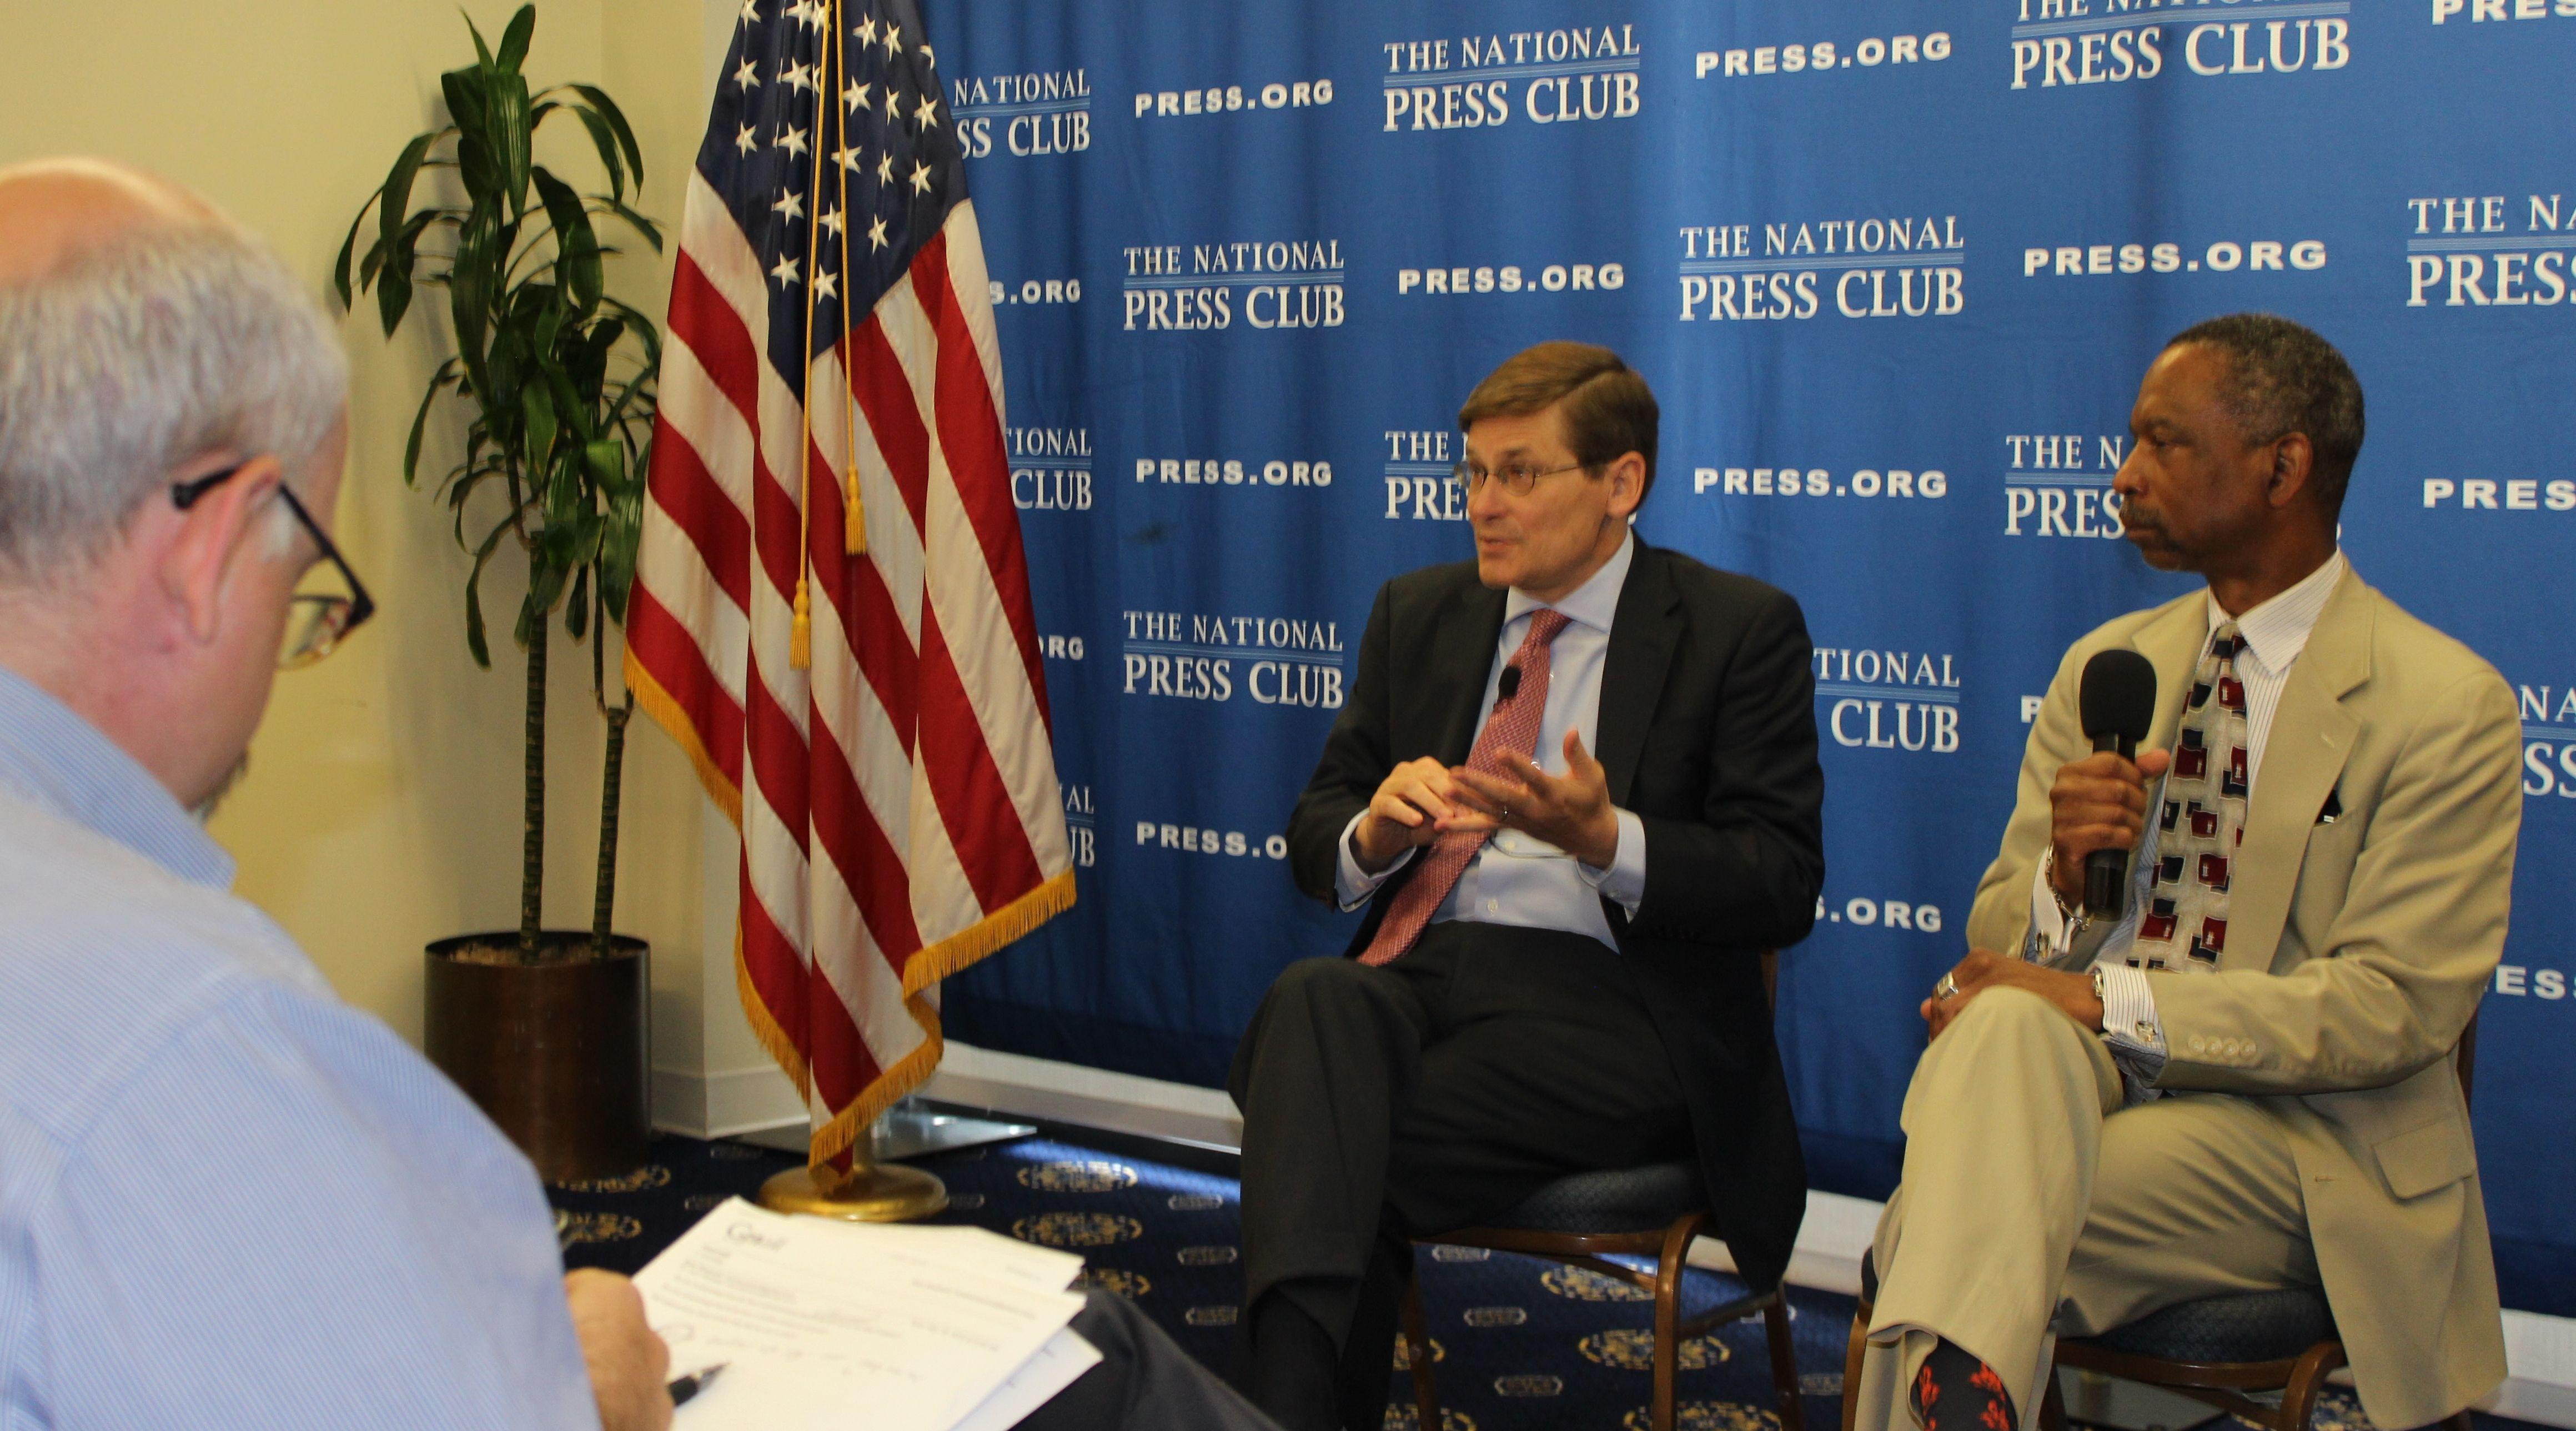 Michael Morell, Keith Hill and Sam Husseini, May 11, 2015 JIP photo